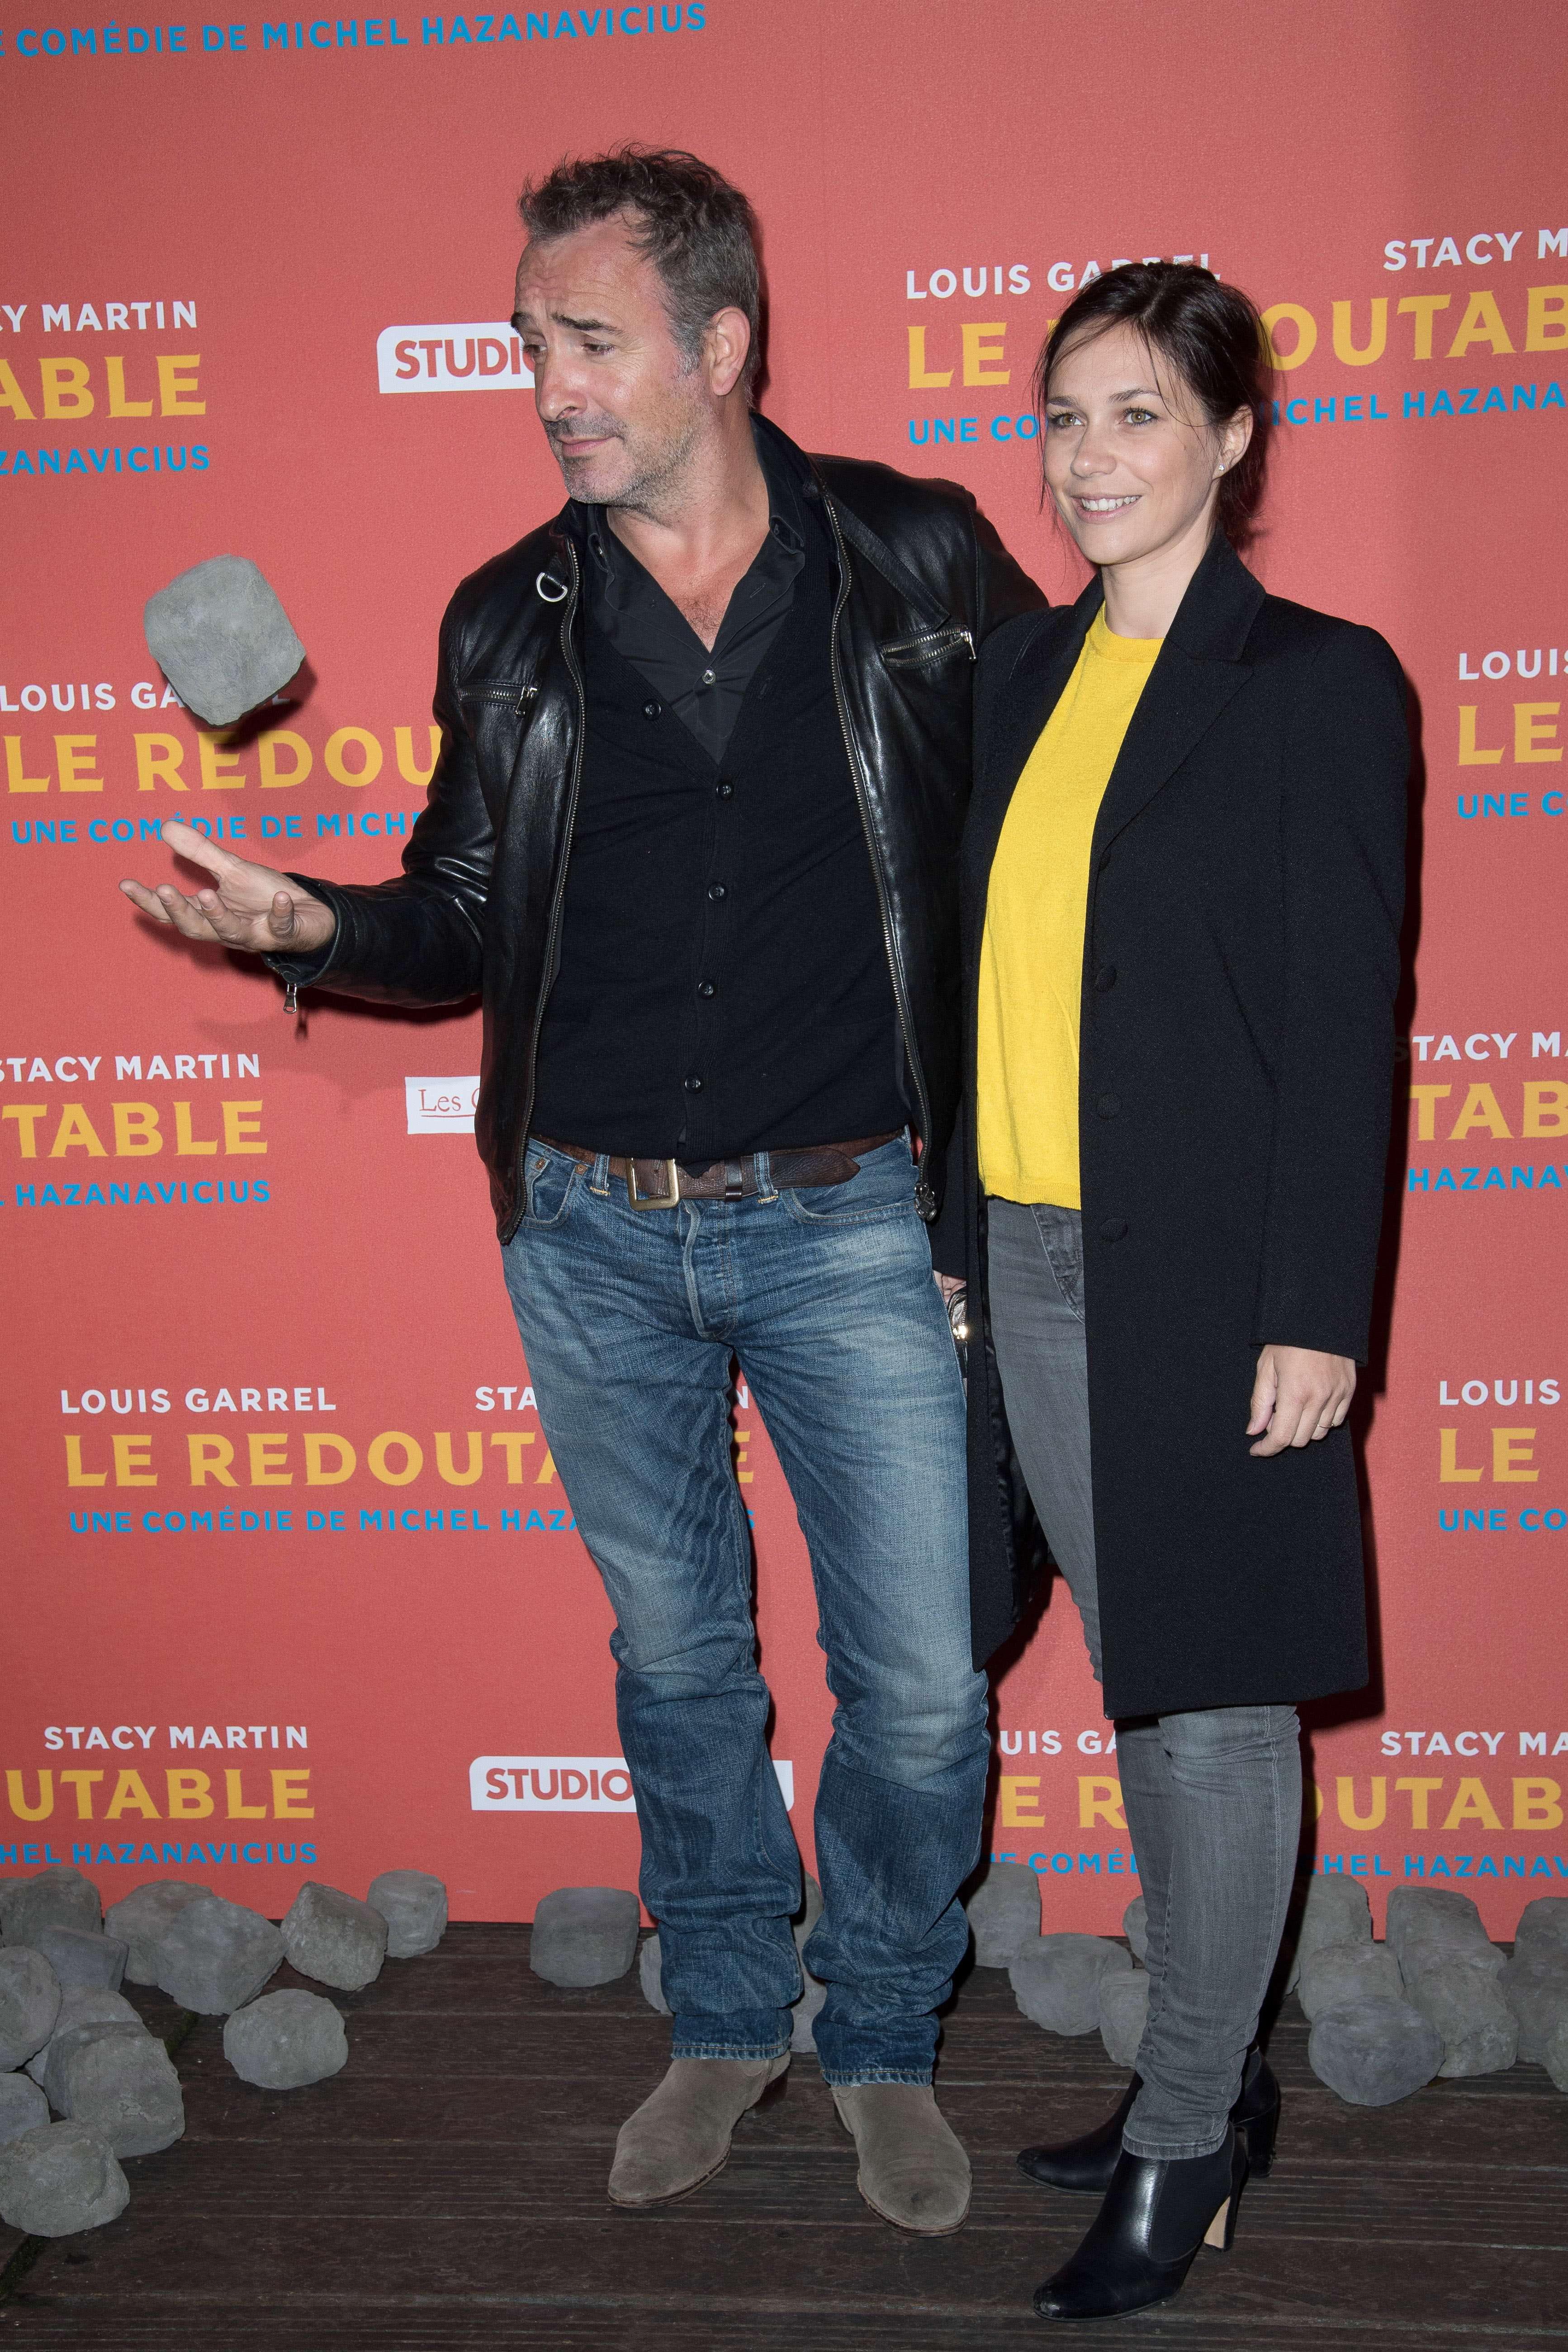 Nathalie pechalat for Dujardin recrutement